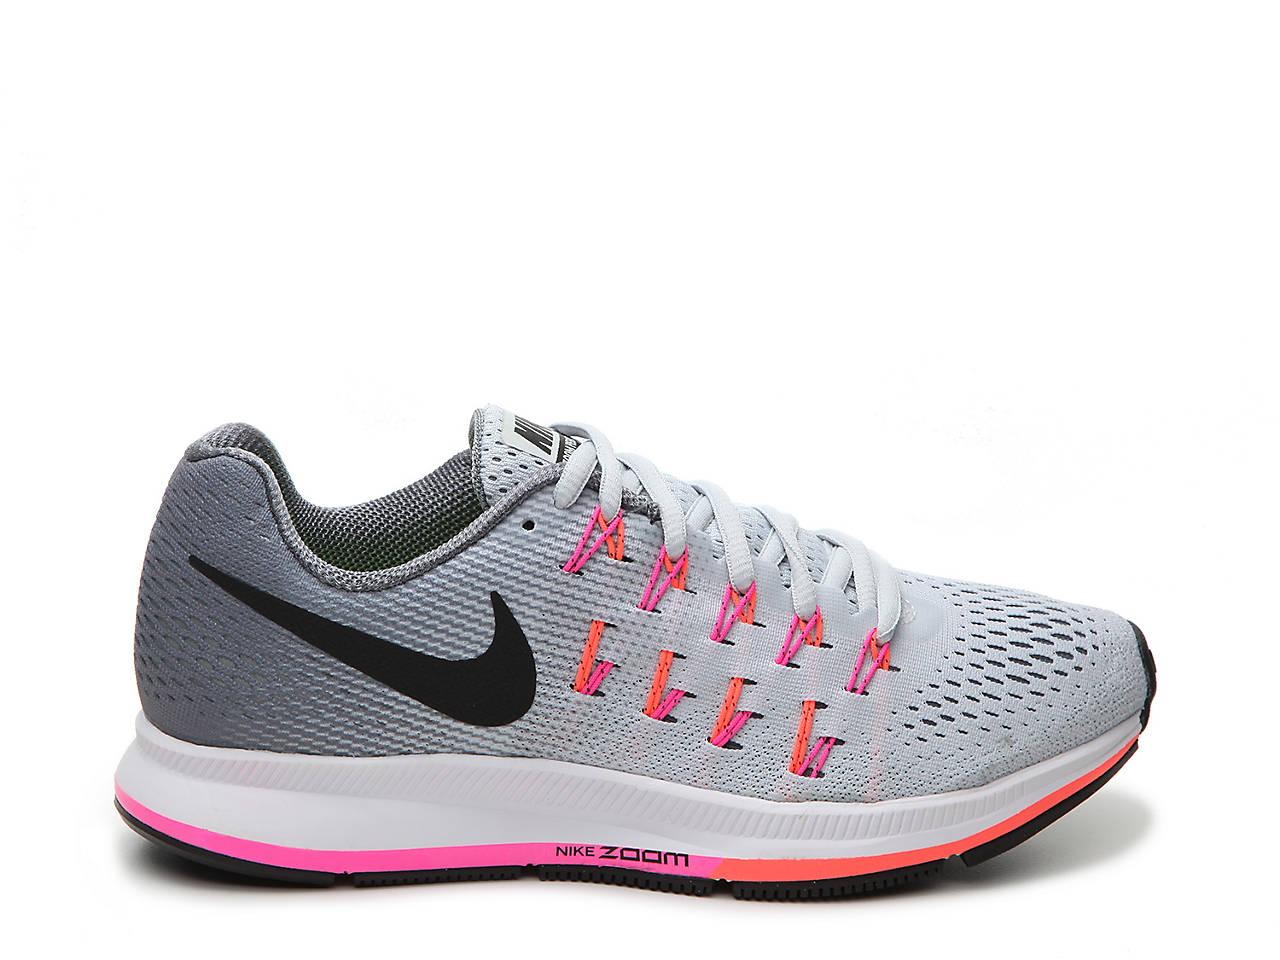 big sale 9f037 d0e45 Air Zoom Pegasus 33 Lightweight Running Shoe - Women's